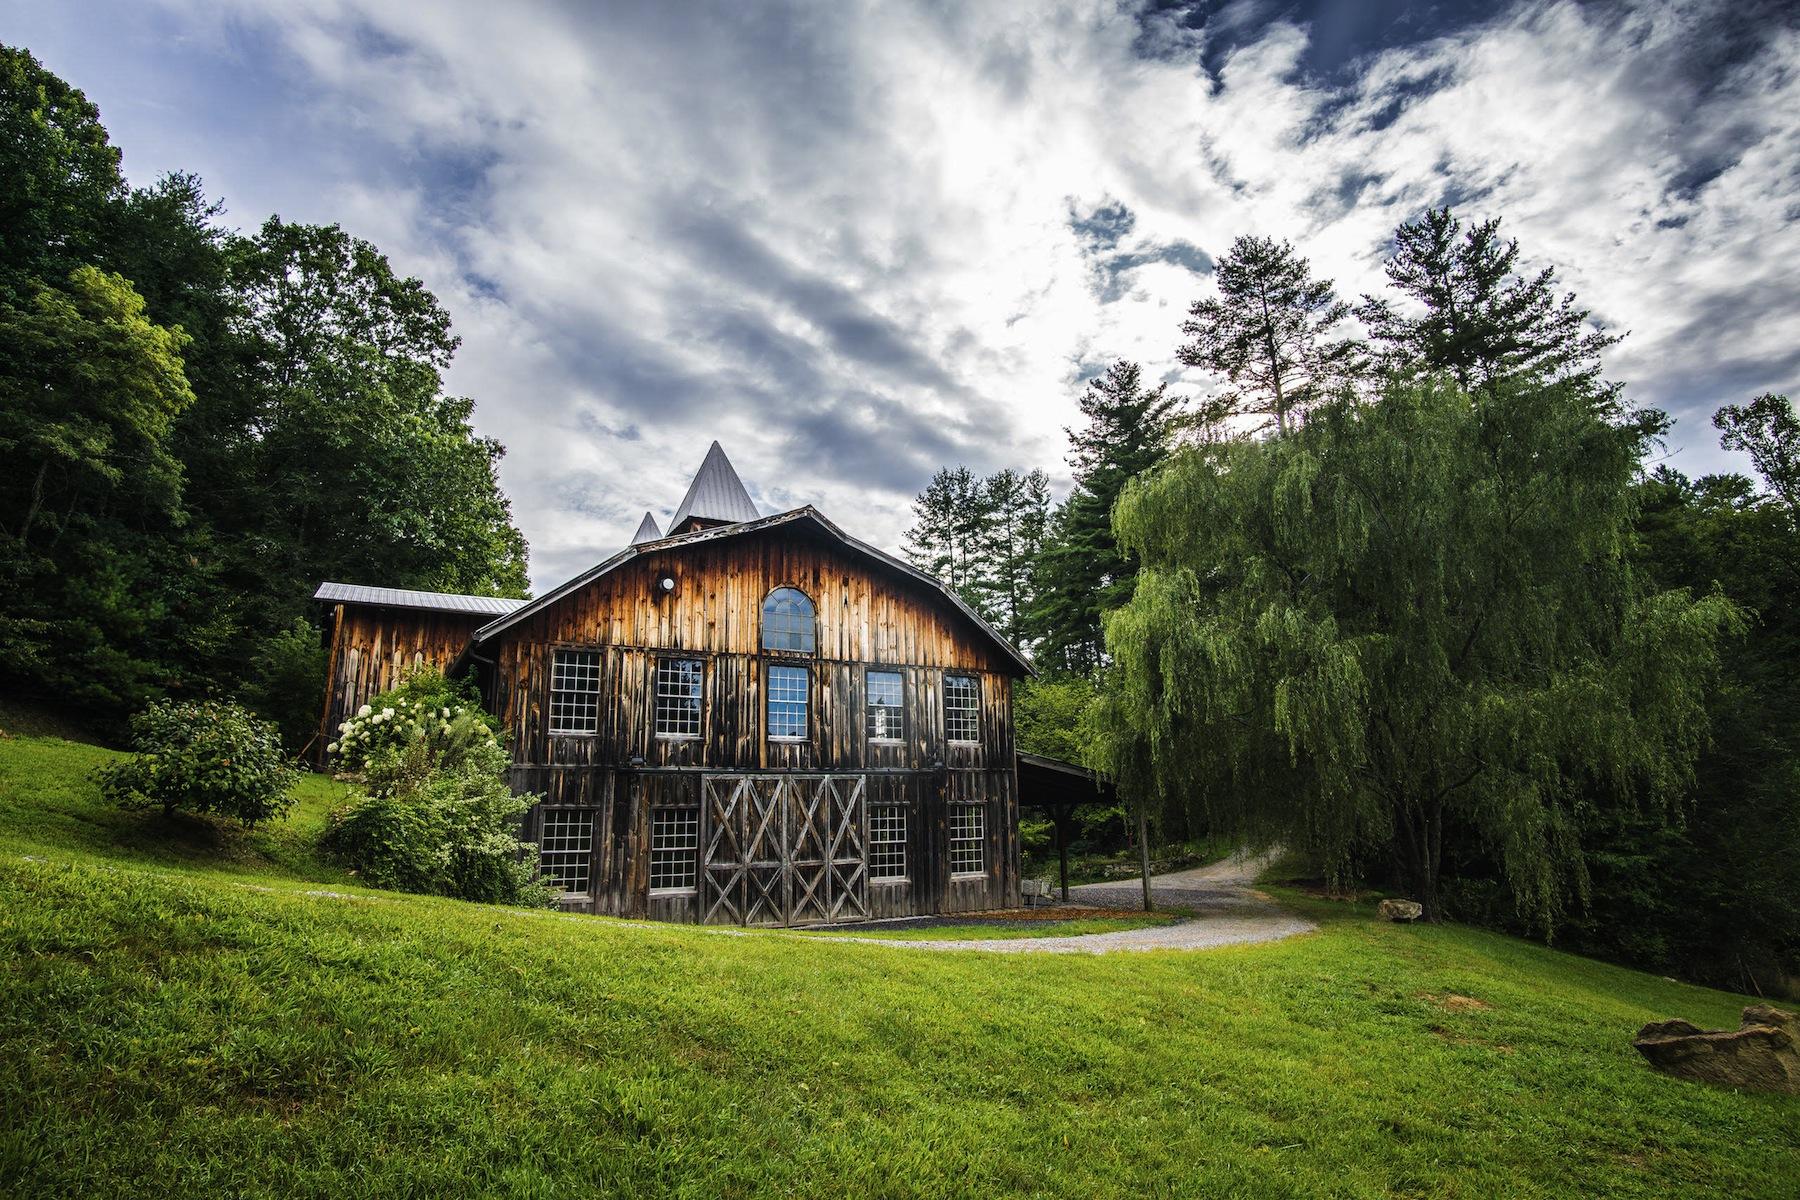 Fines Creek Farm Clyde Nc Rustic Wedding Guide